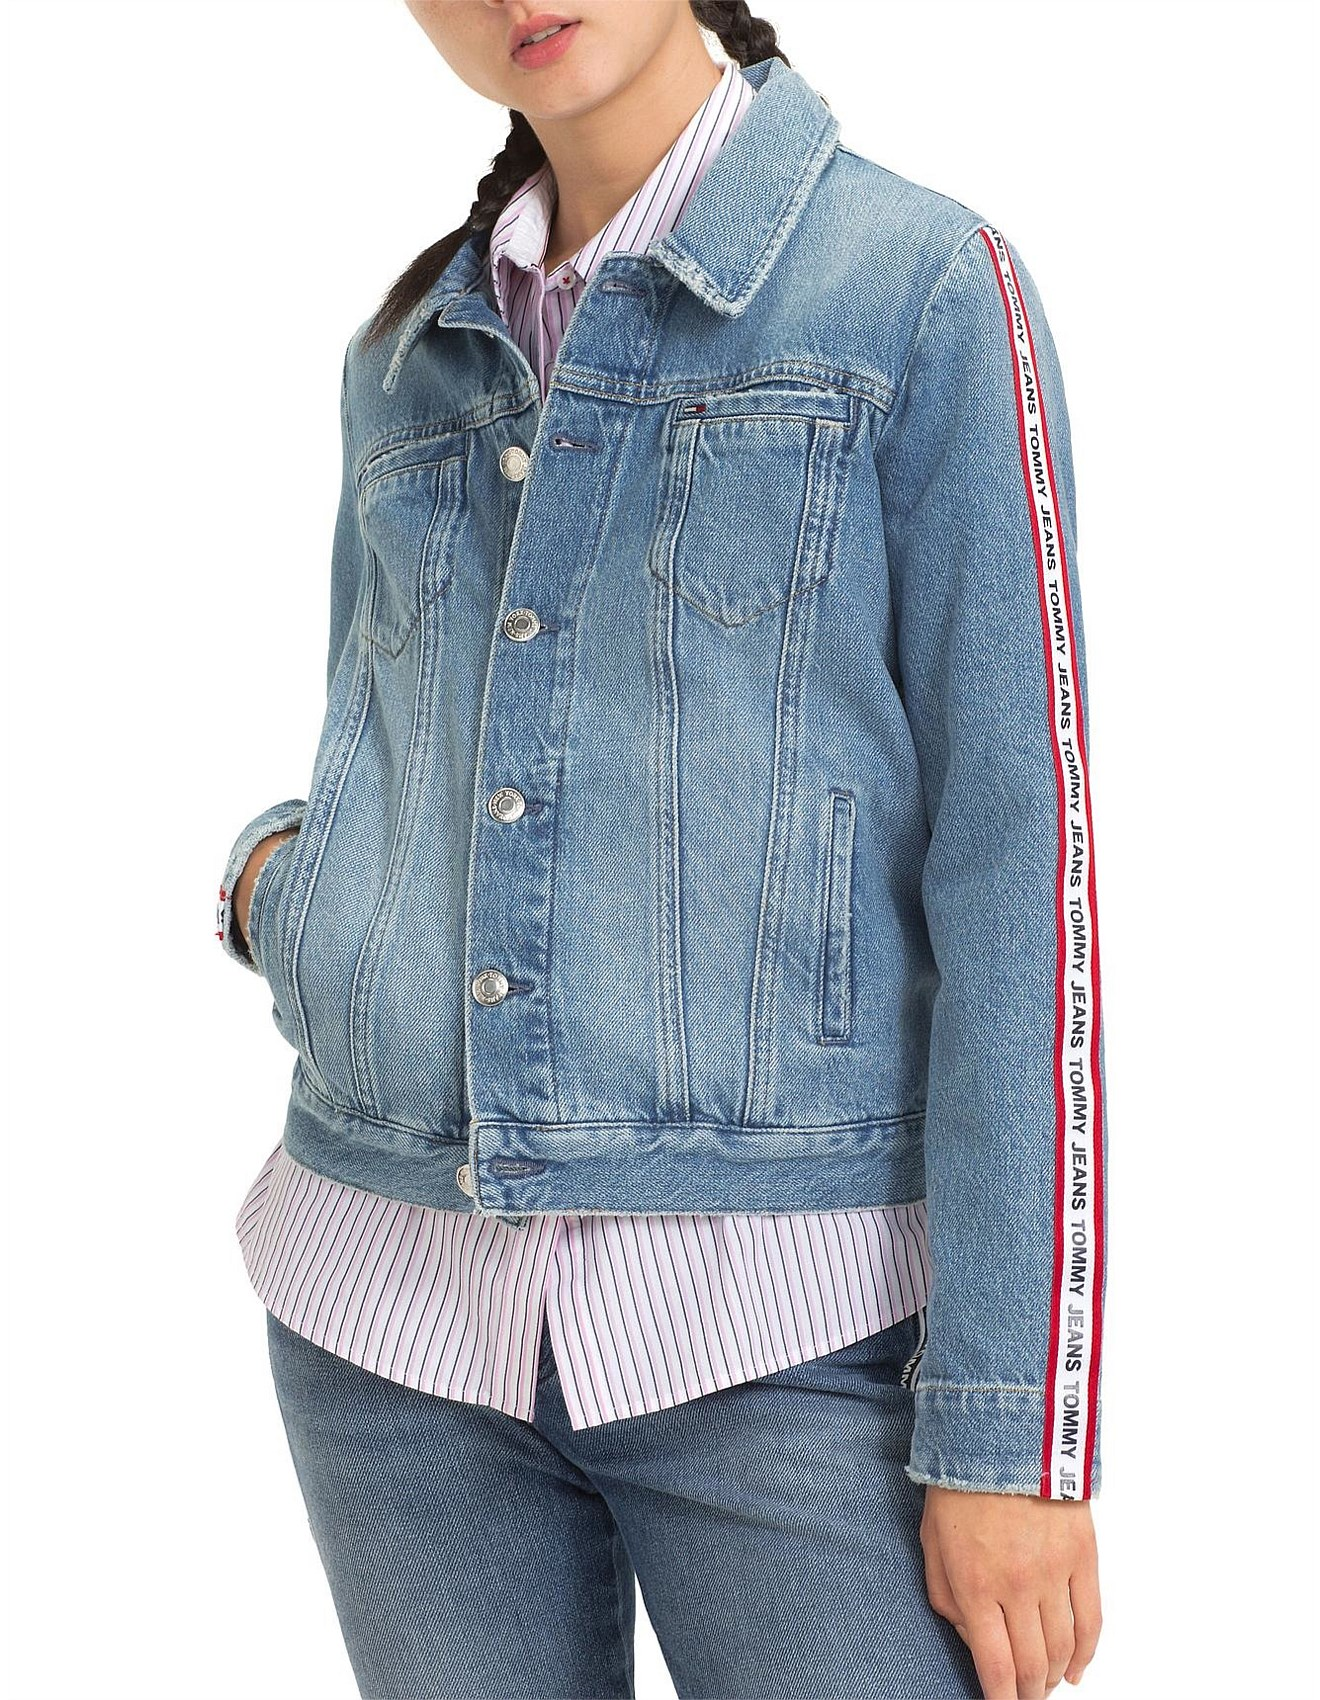 d8d96afb Women's Denim Jackets | Buy Denim Jackets Online | David Jones - Regular  Trucker Jacket With Sleeve Tape